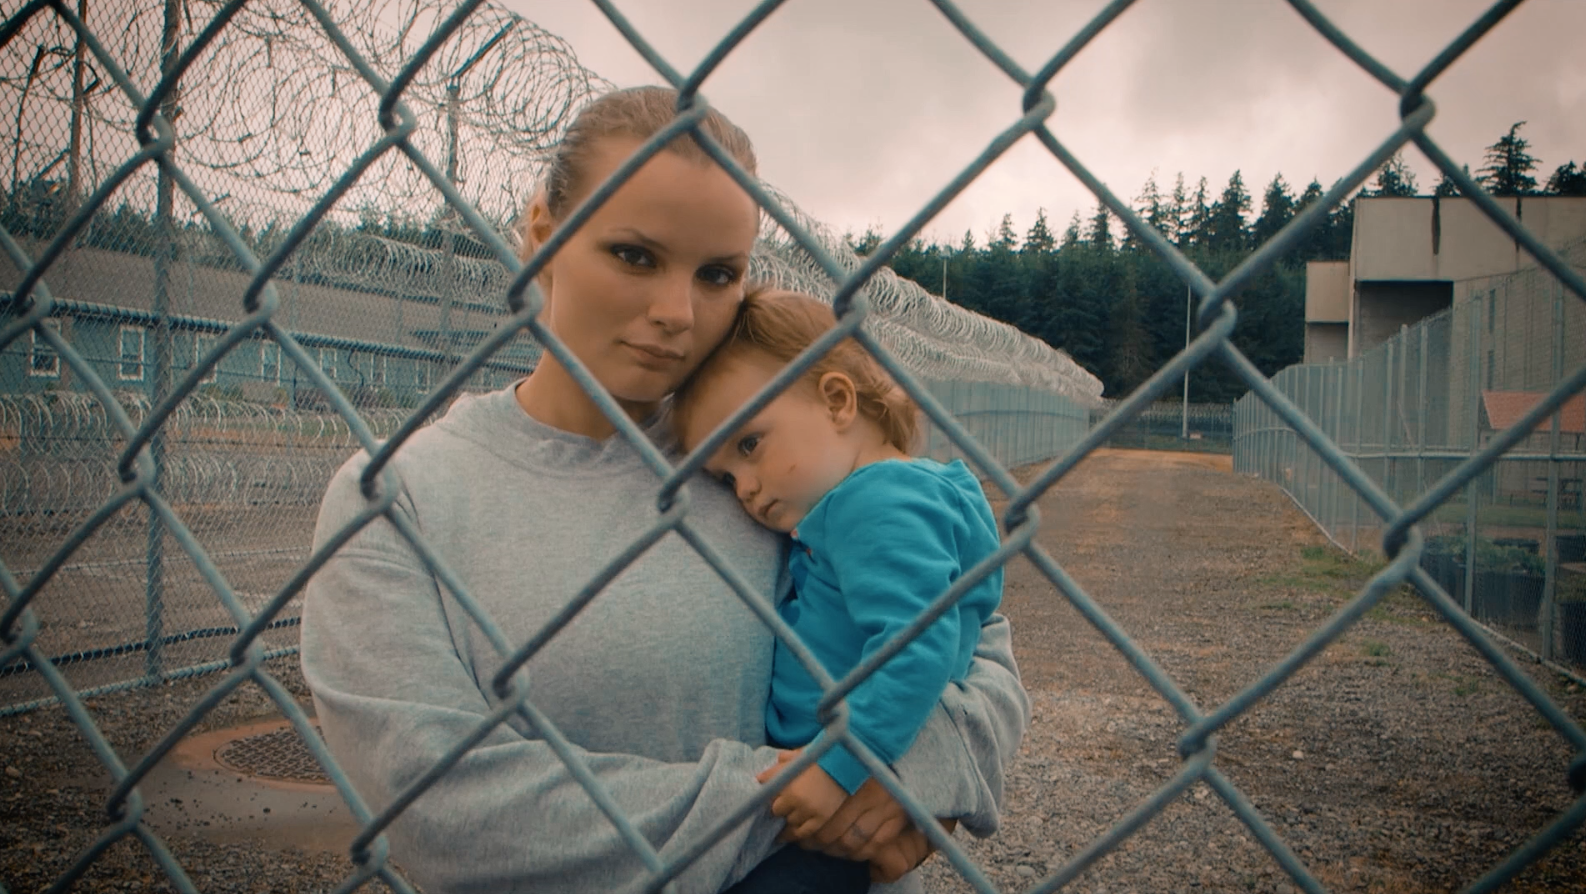 kids behind bars.jpeg